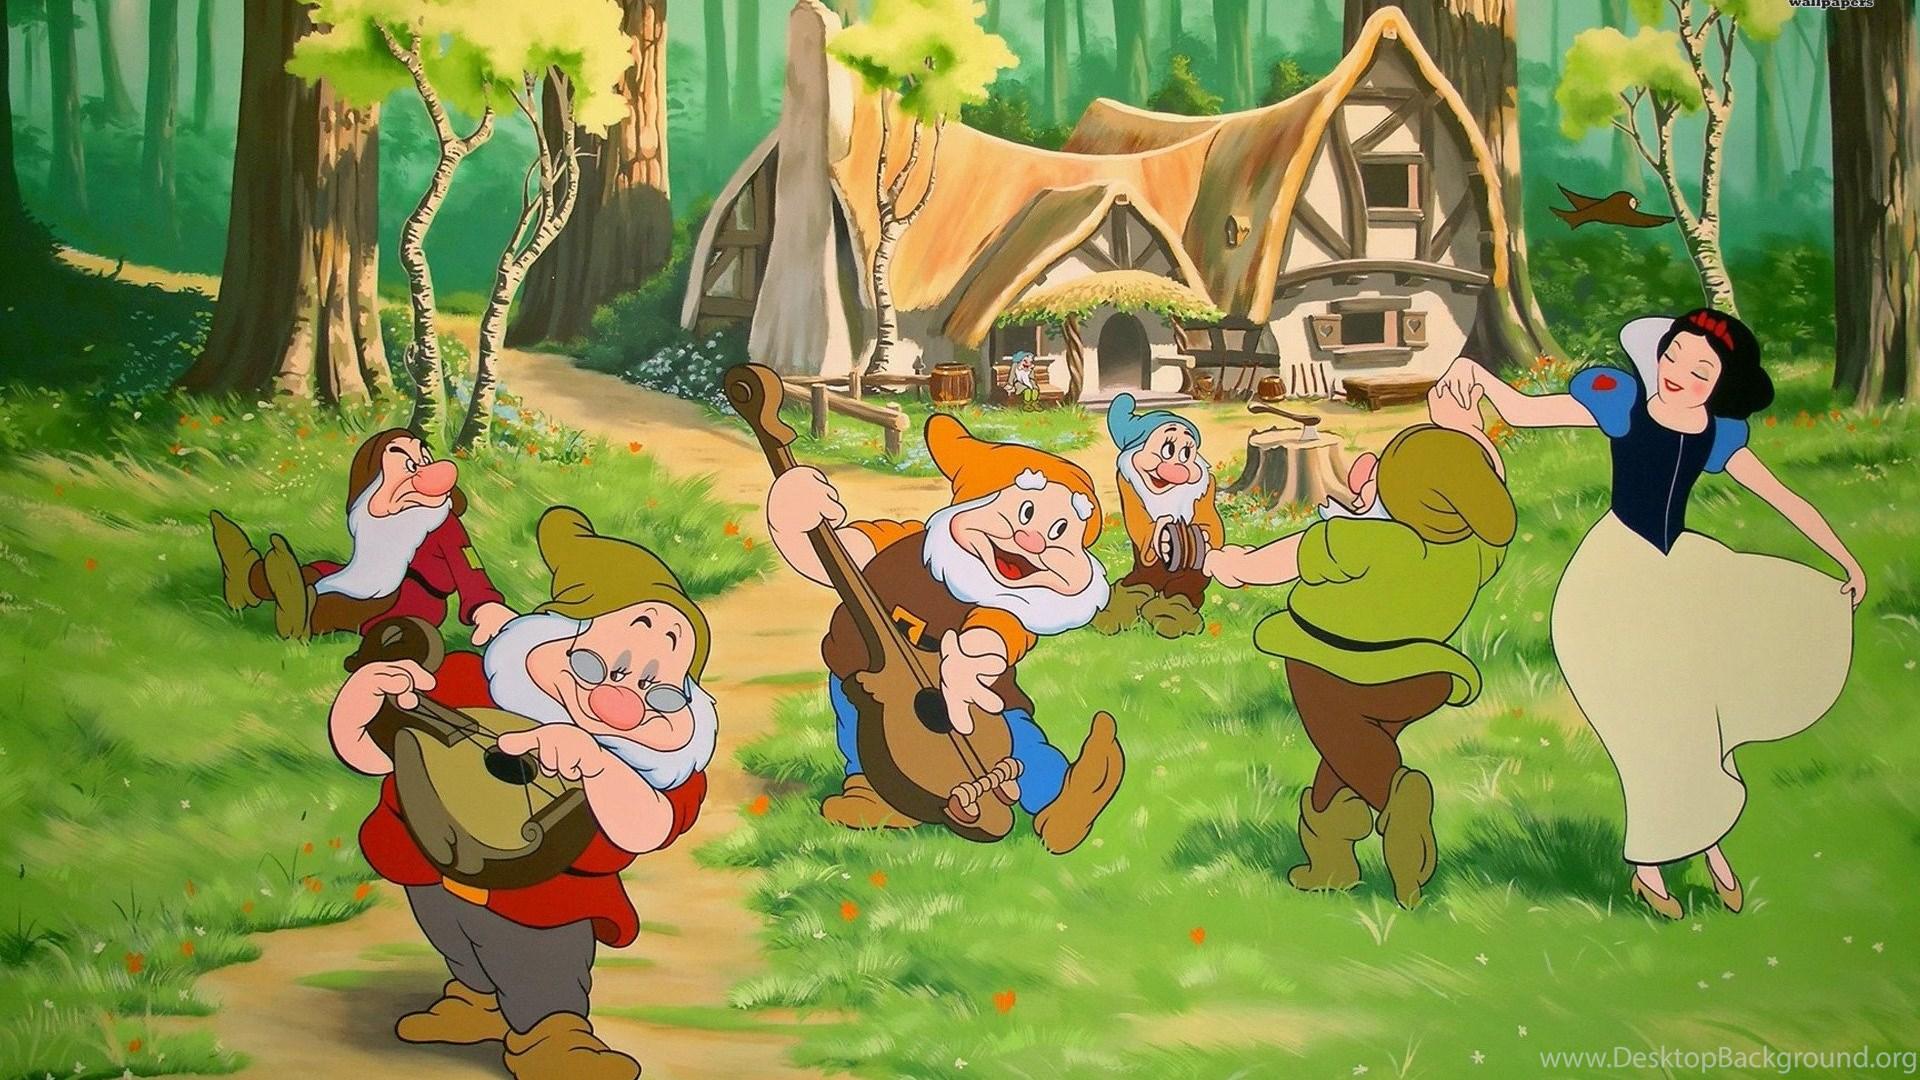 snow white and the seven dwarfs names wallpaper desktop background